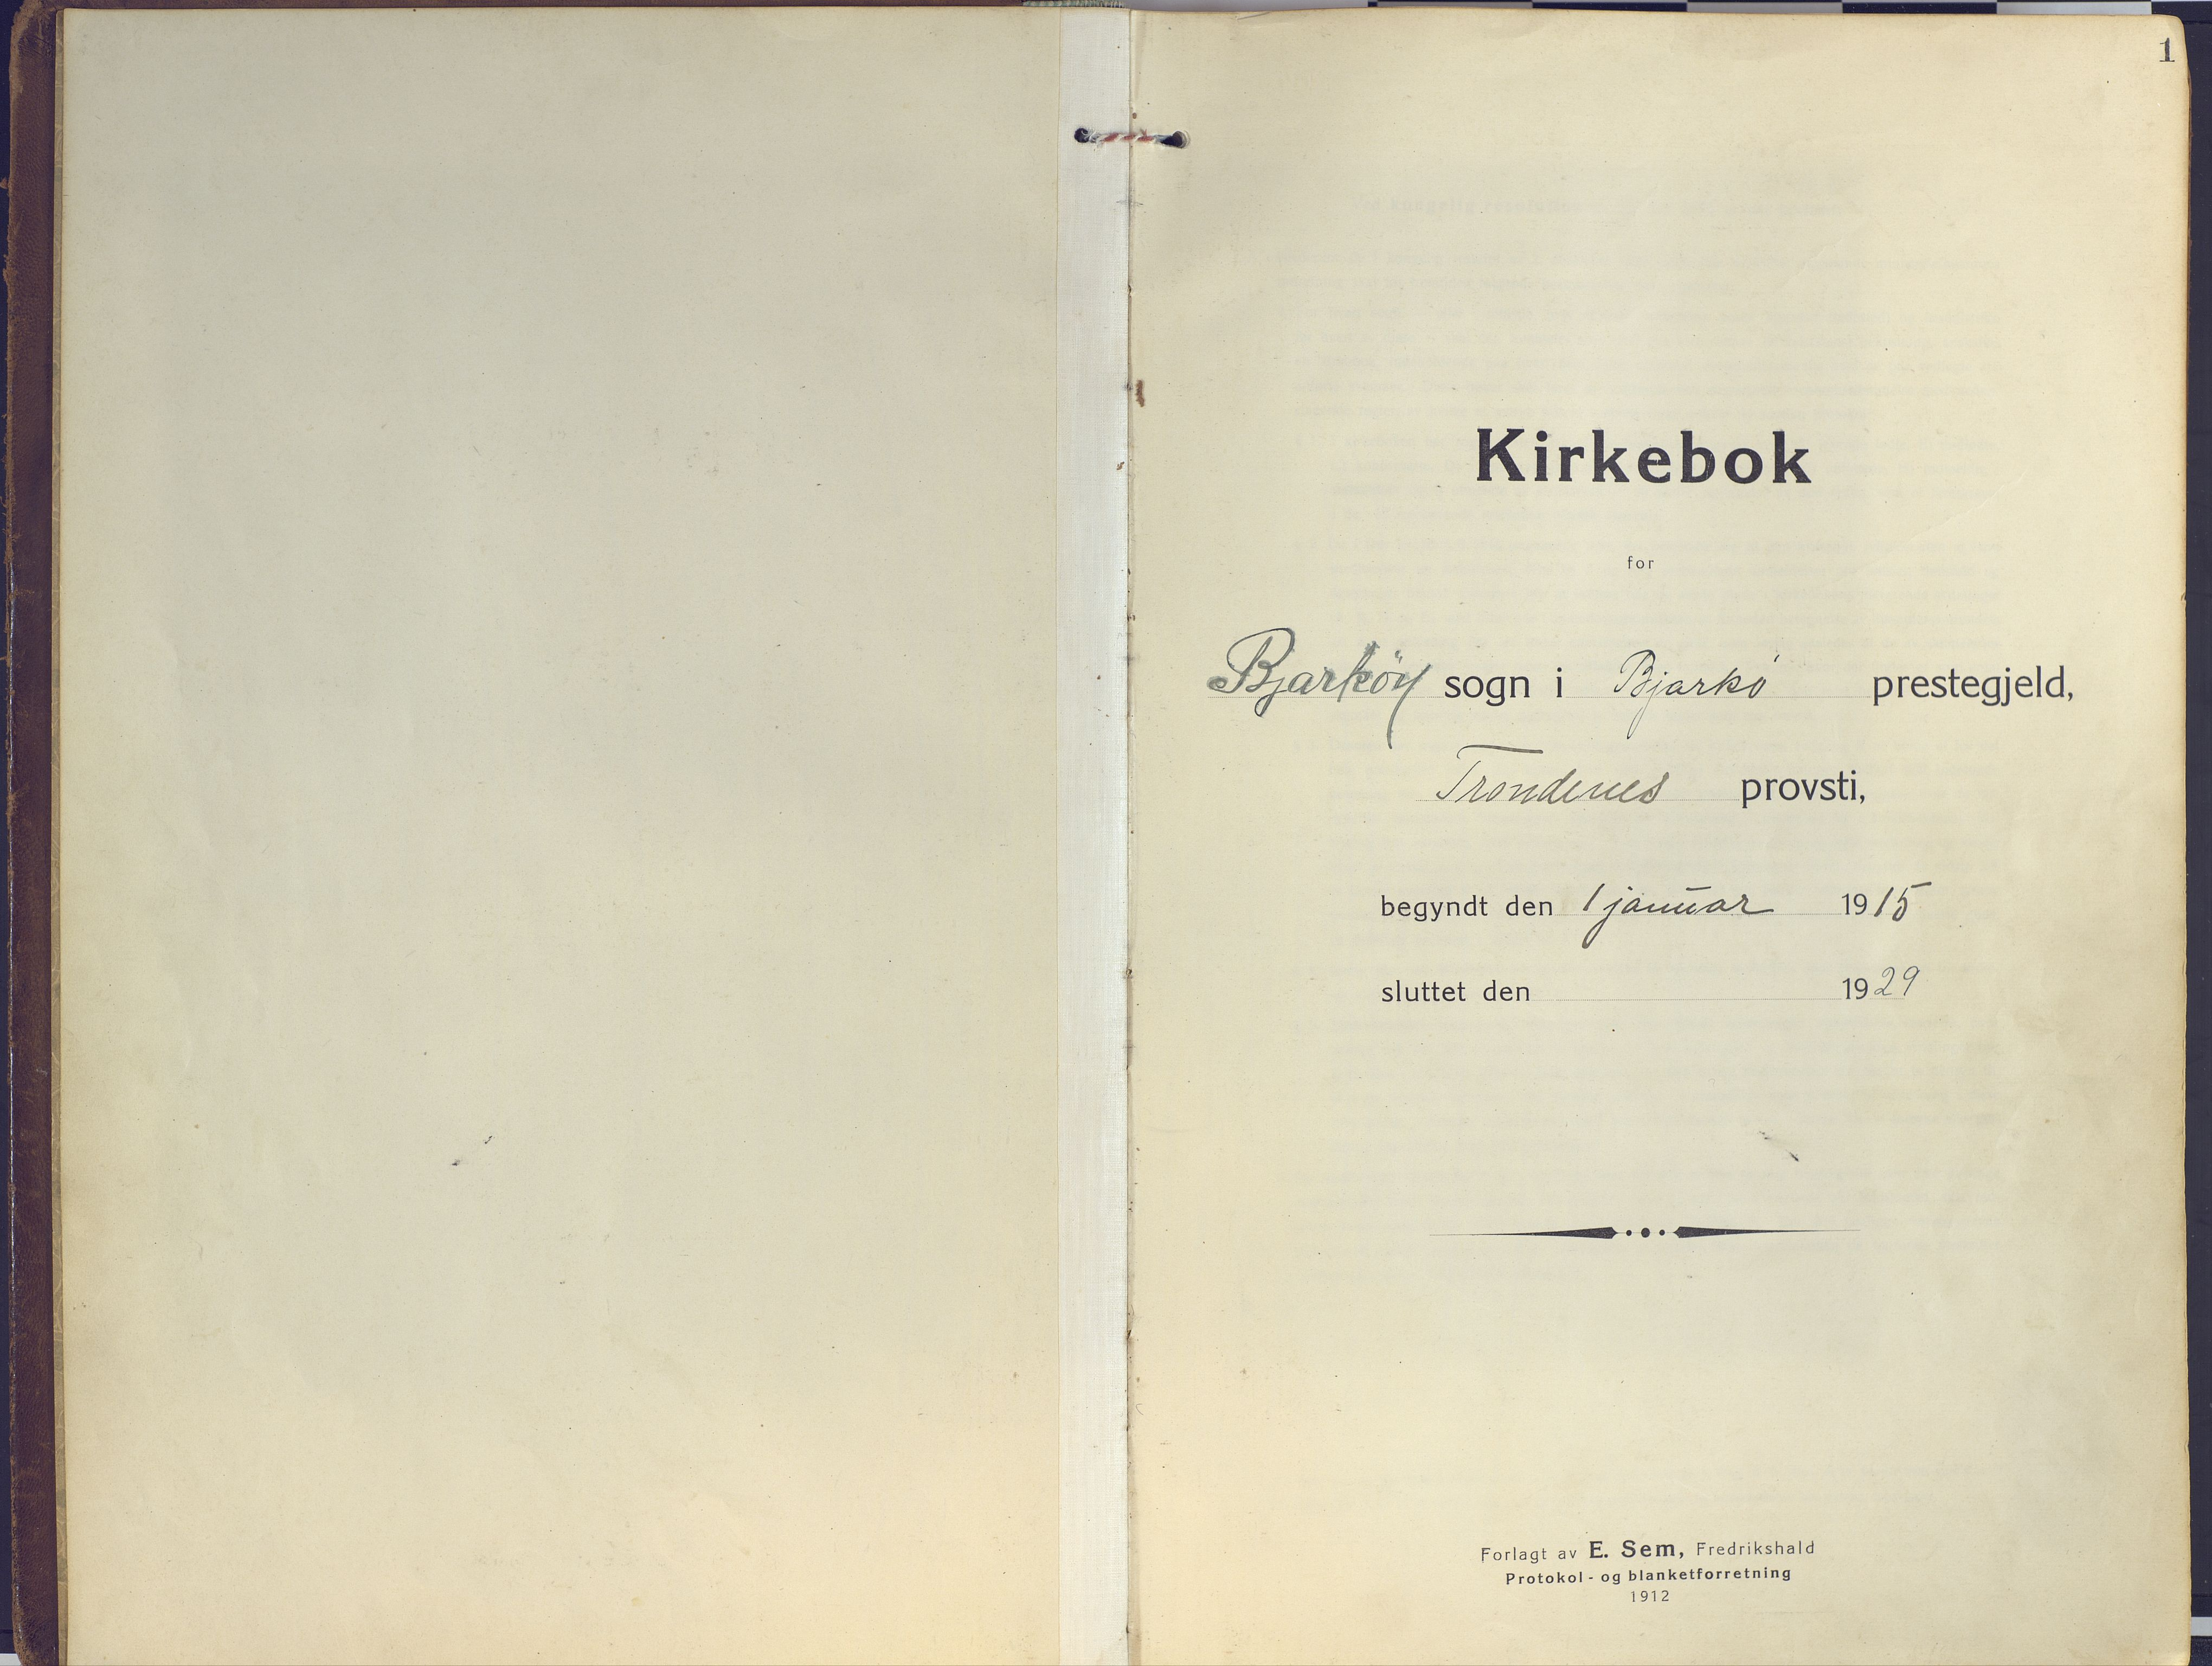 SATØ, Sand/Bjarkøy sokneprestkontor, I/Ia/Iaa/L0006kirke: Ministerialbok nr. 6, 1915-1929, s. 1